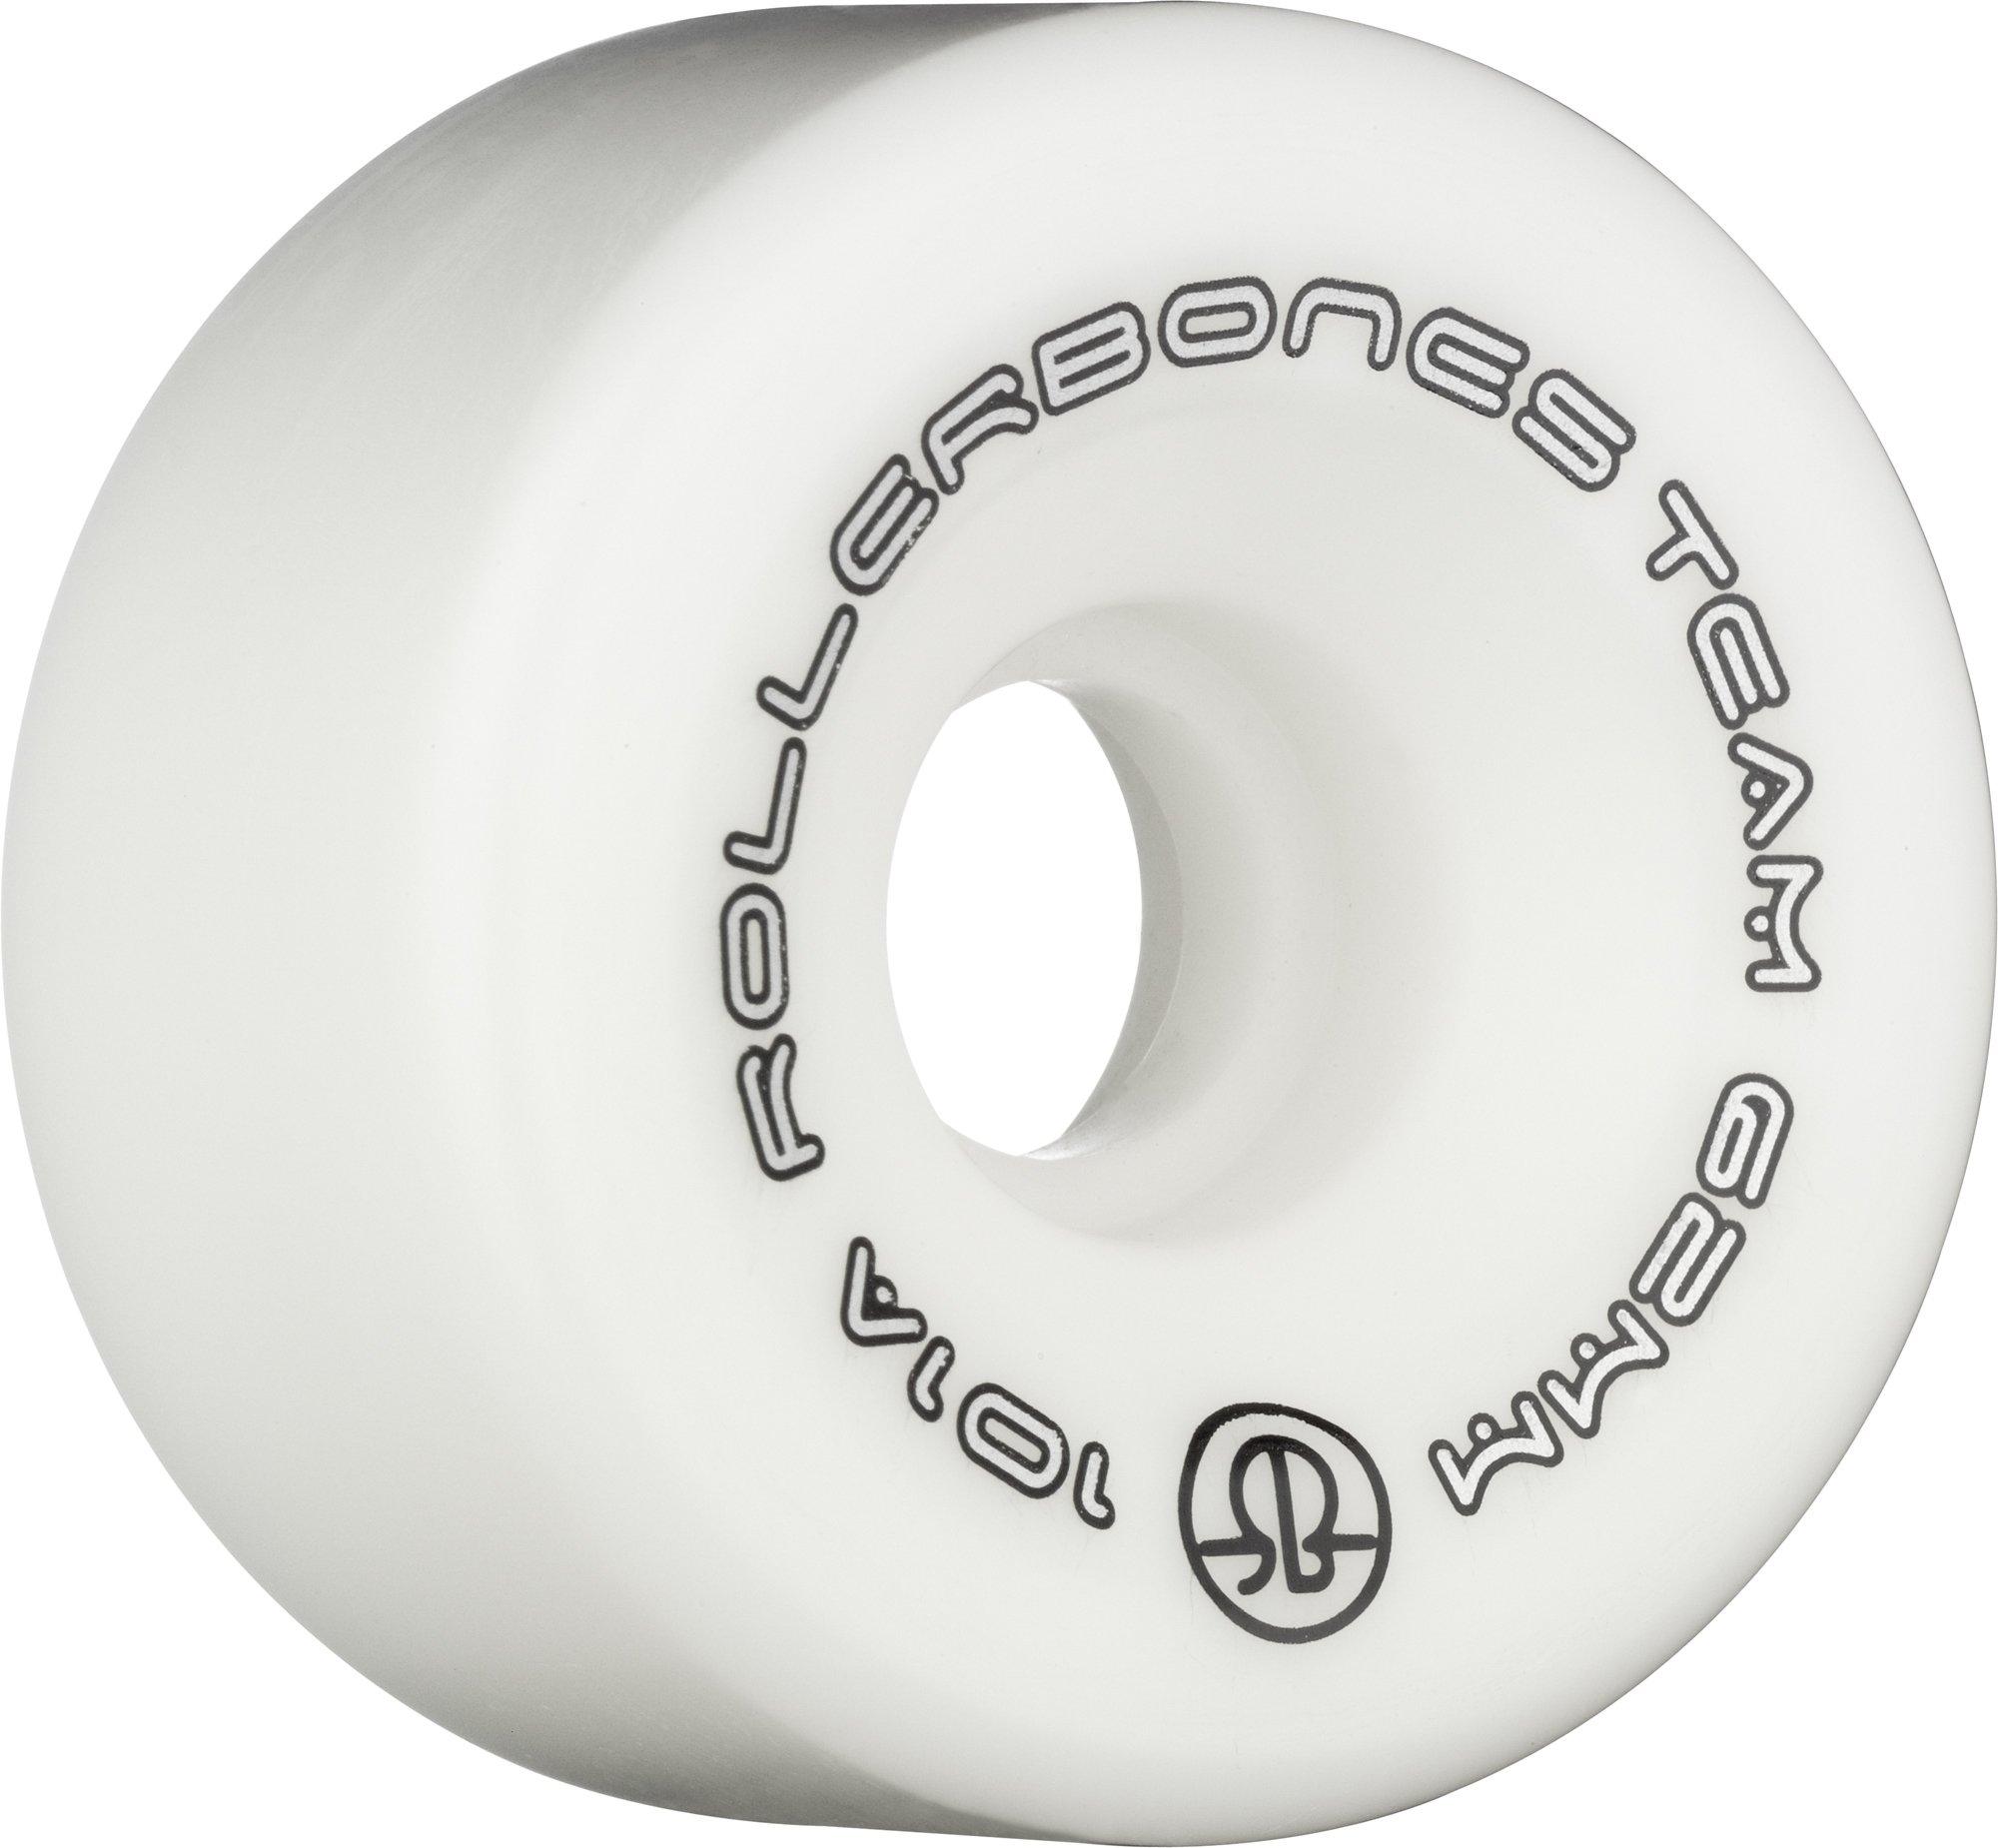 Rollerbones Team Logo 101A Recreational Roller Skate Wheels (Set of 8), White, 57mm